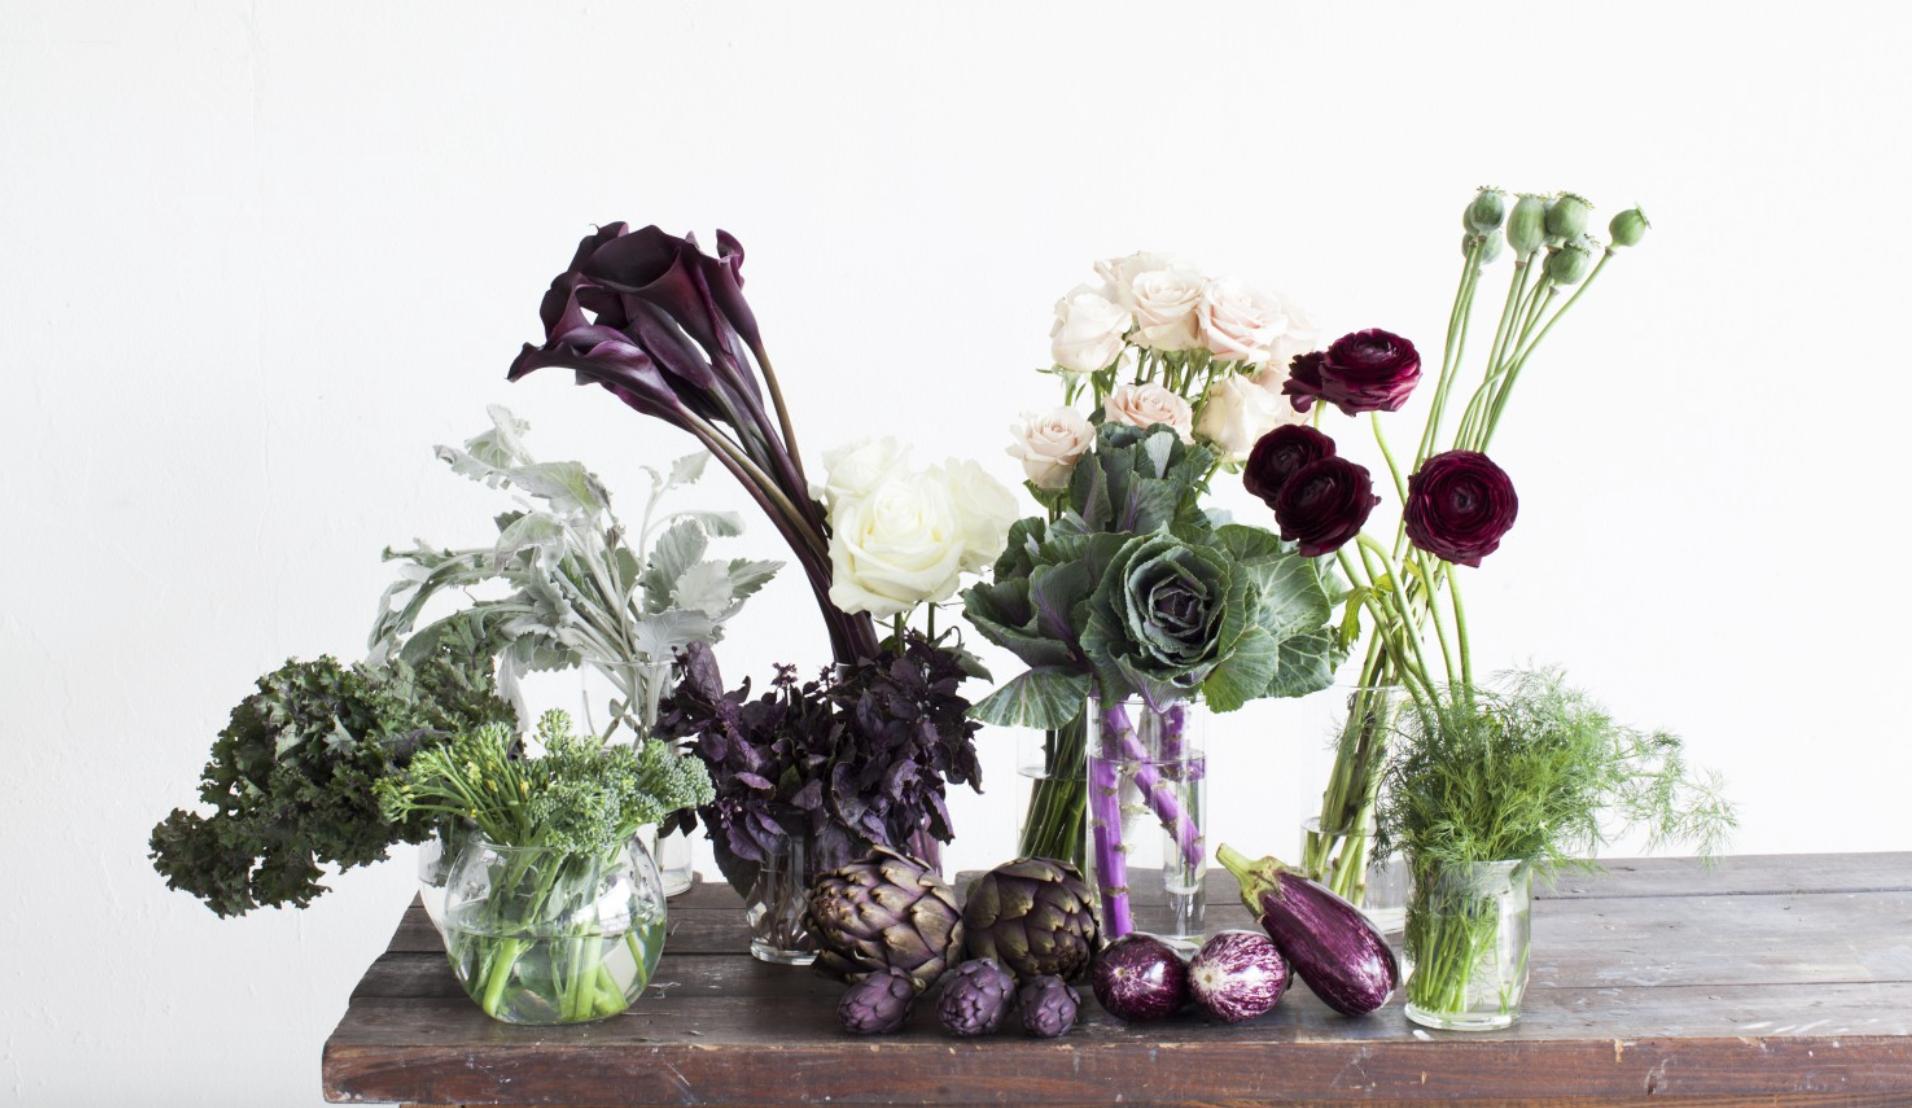 kale-arrangement-eggplant-purple-greenery-magazine-feature-maxit-flower-design-in-houston-texas